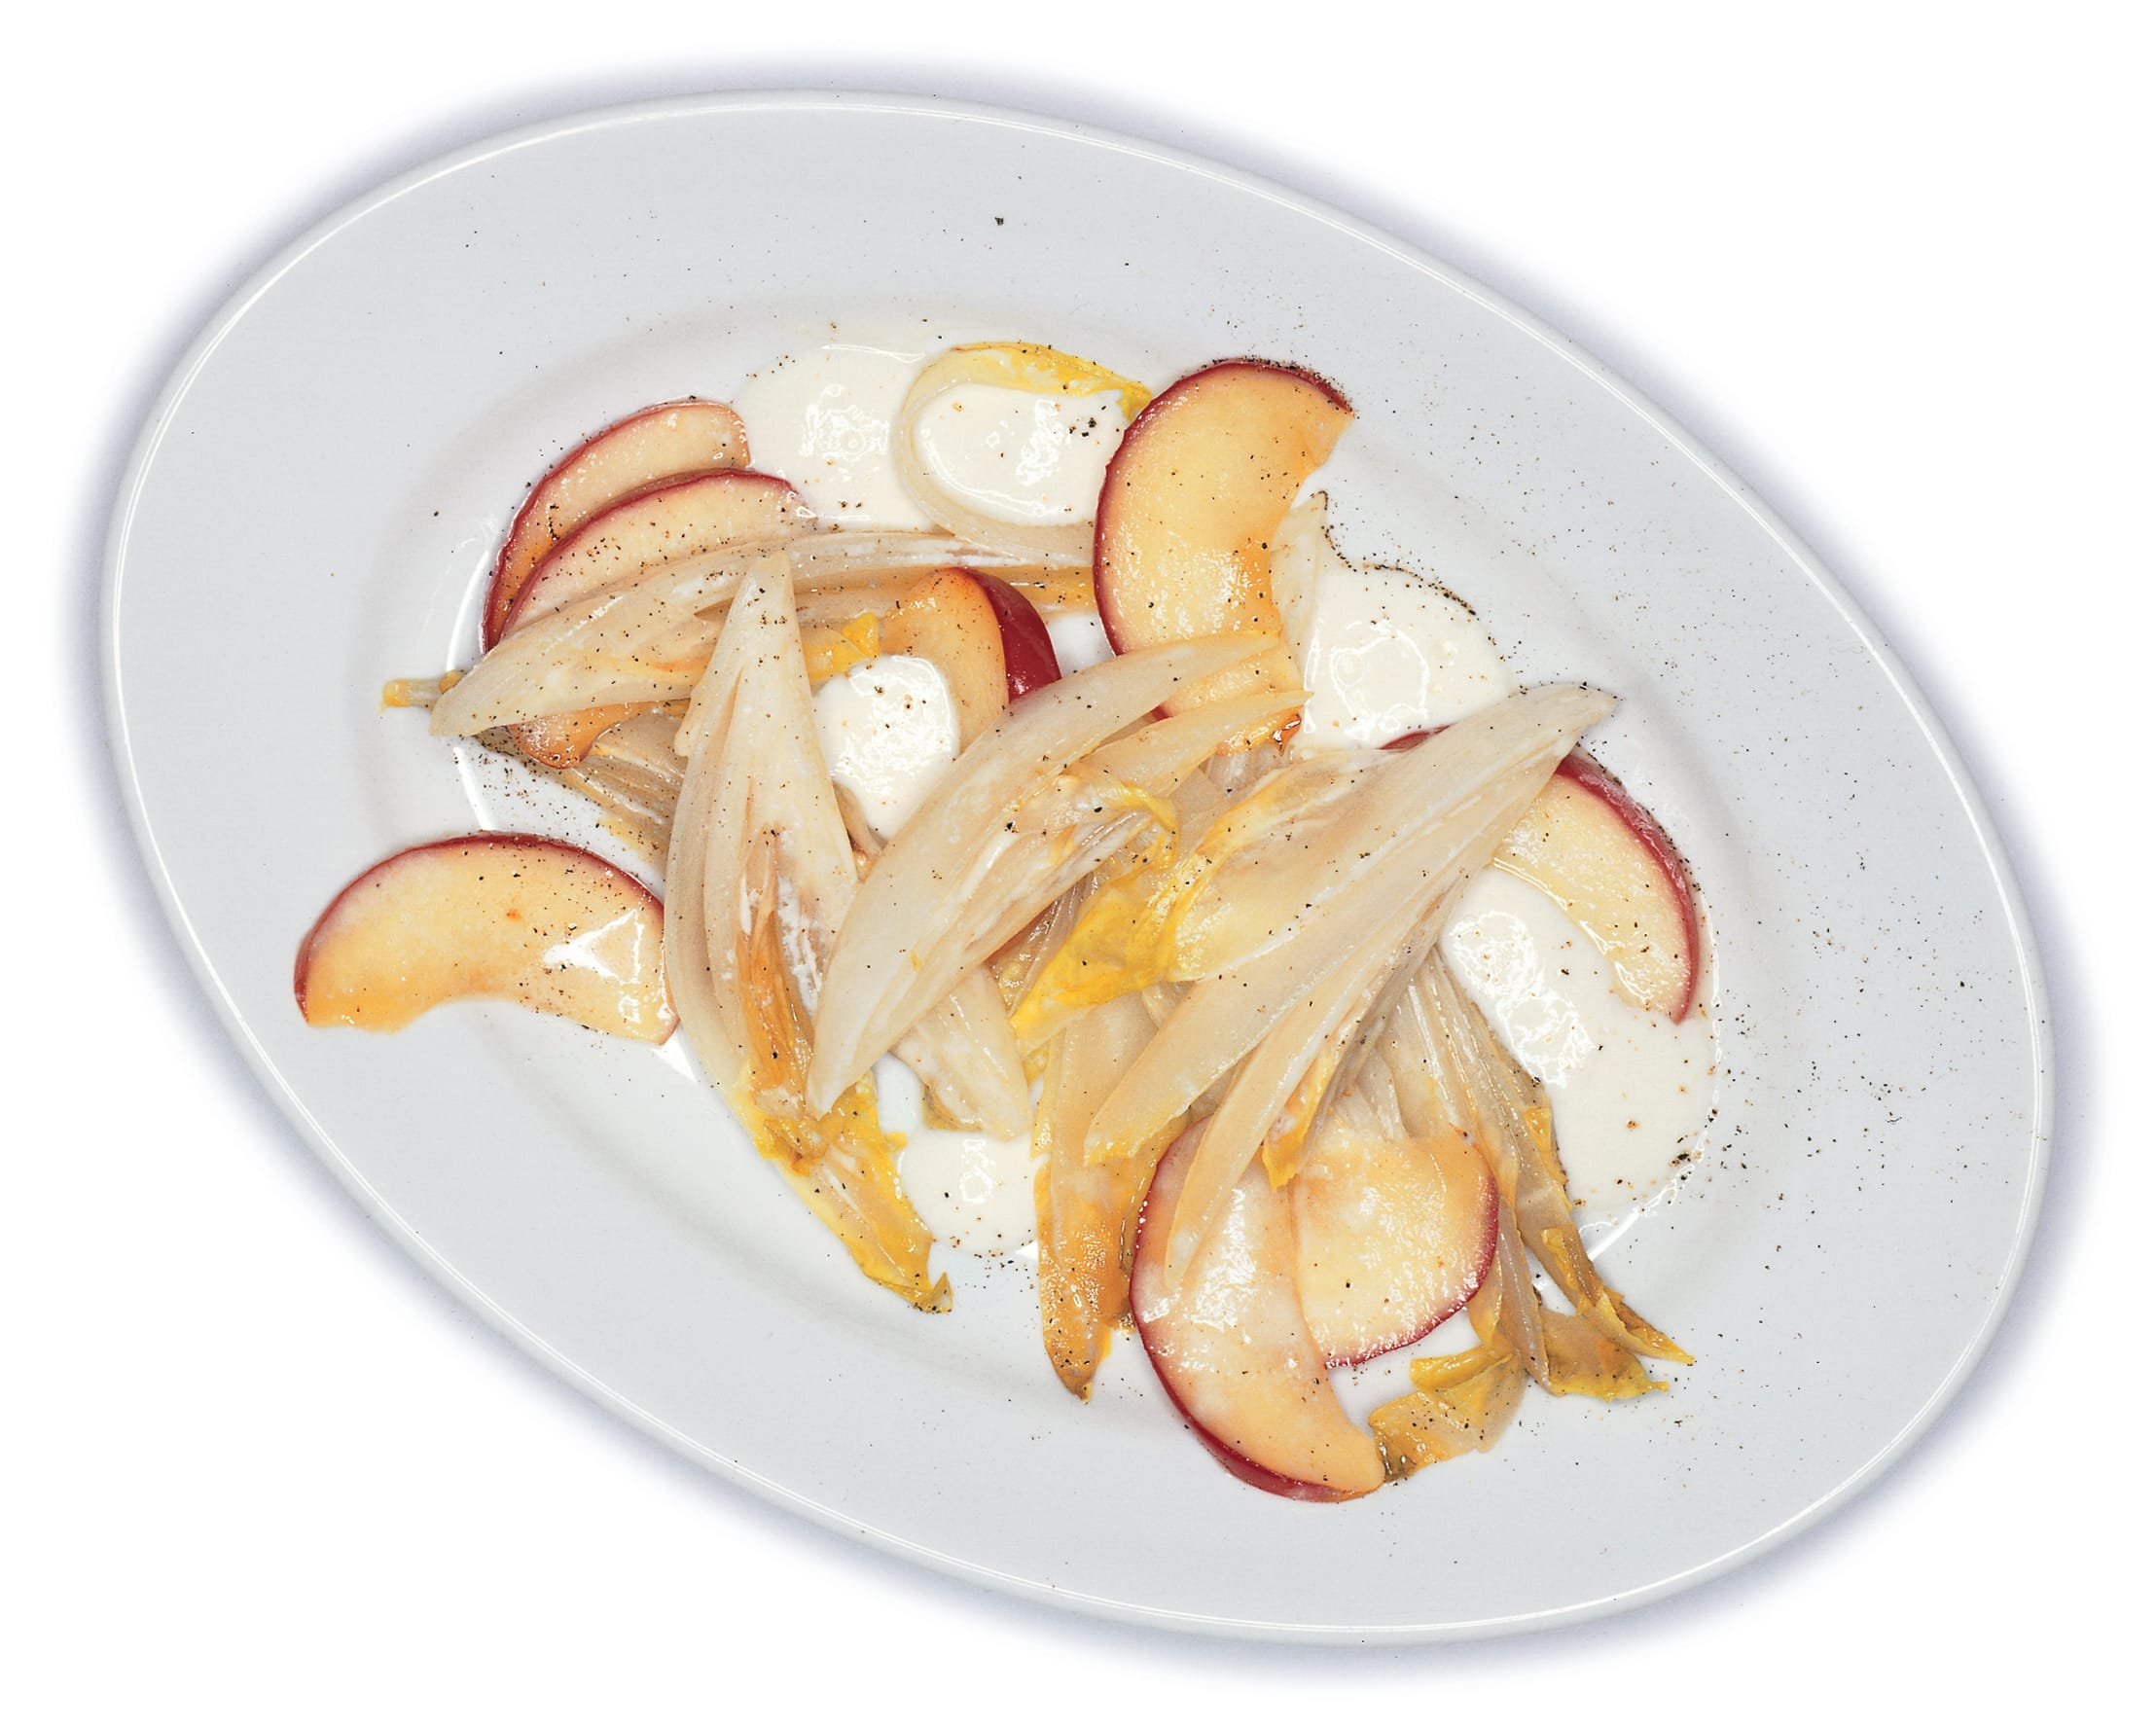 Caramelisiertes Chicorée-Apfel-Gemüse